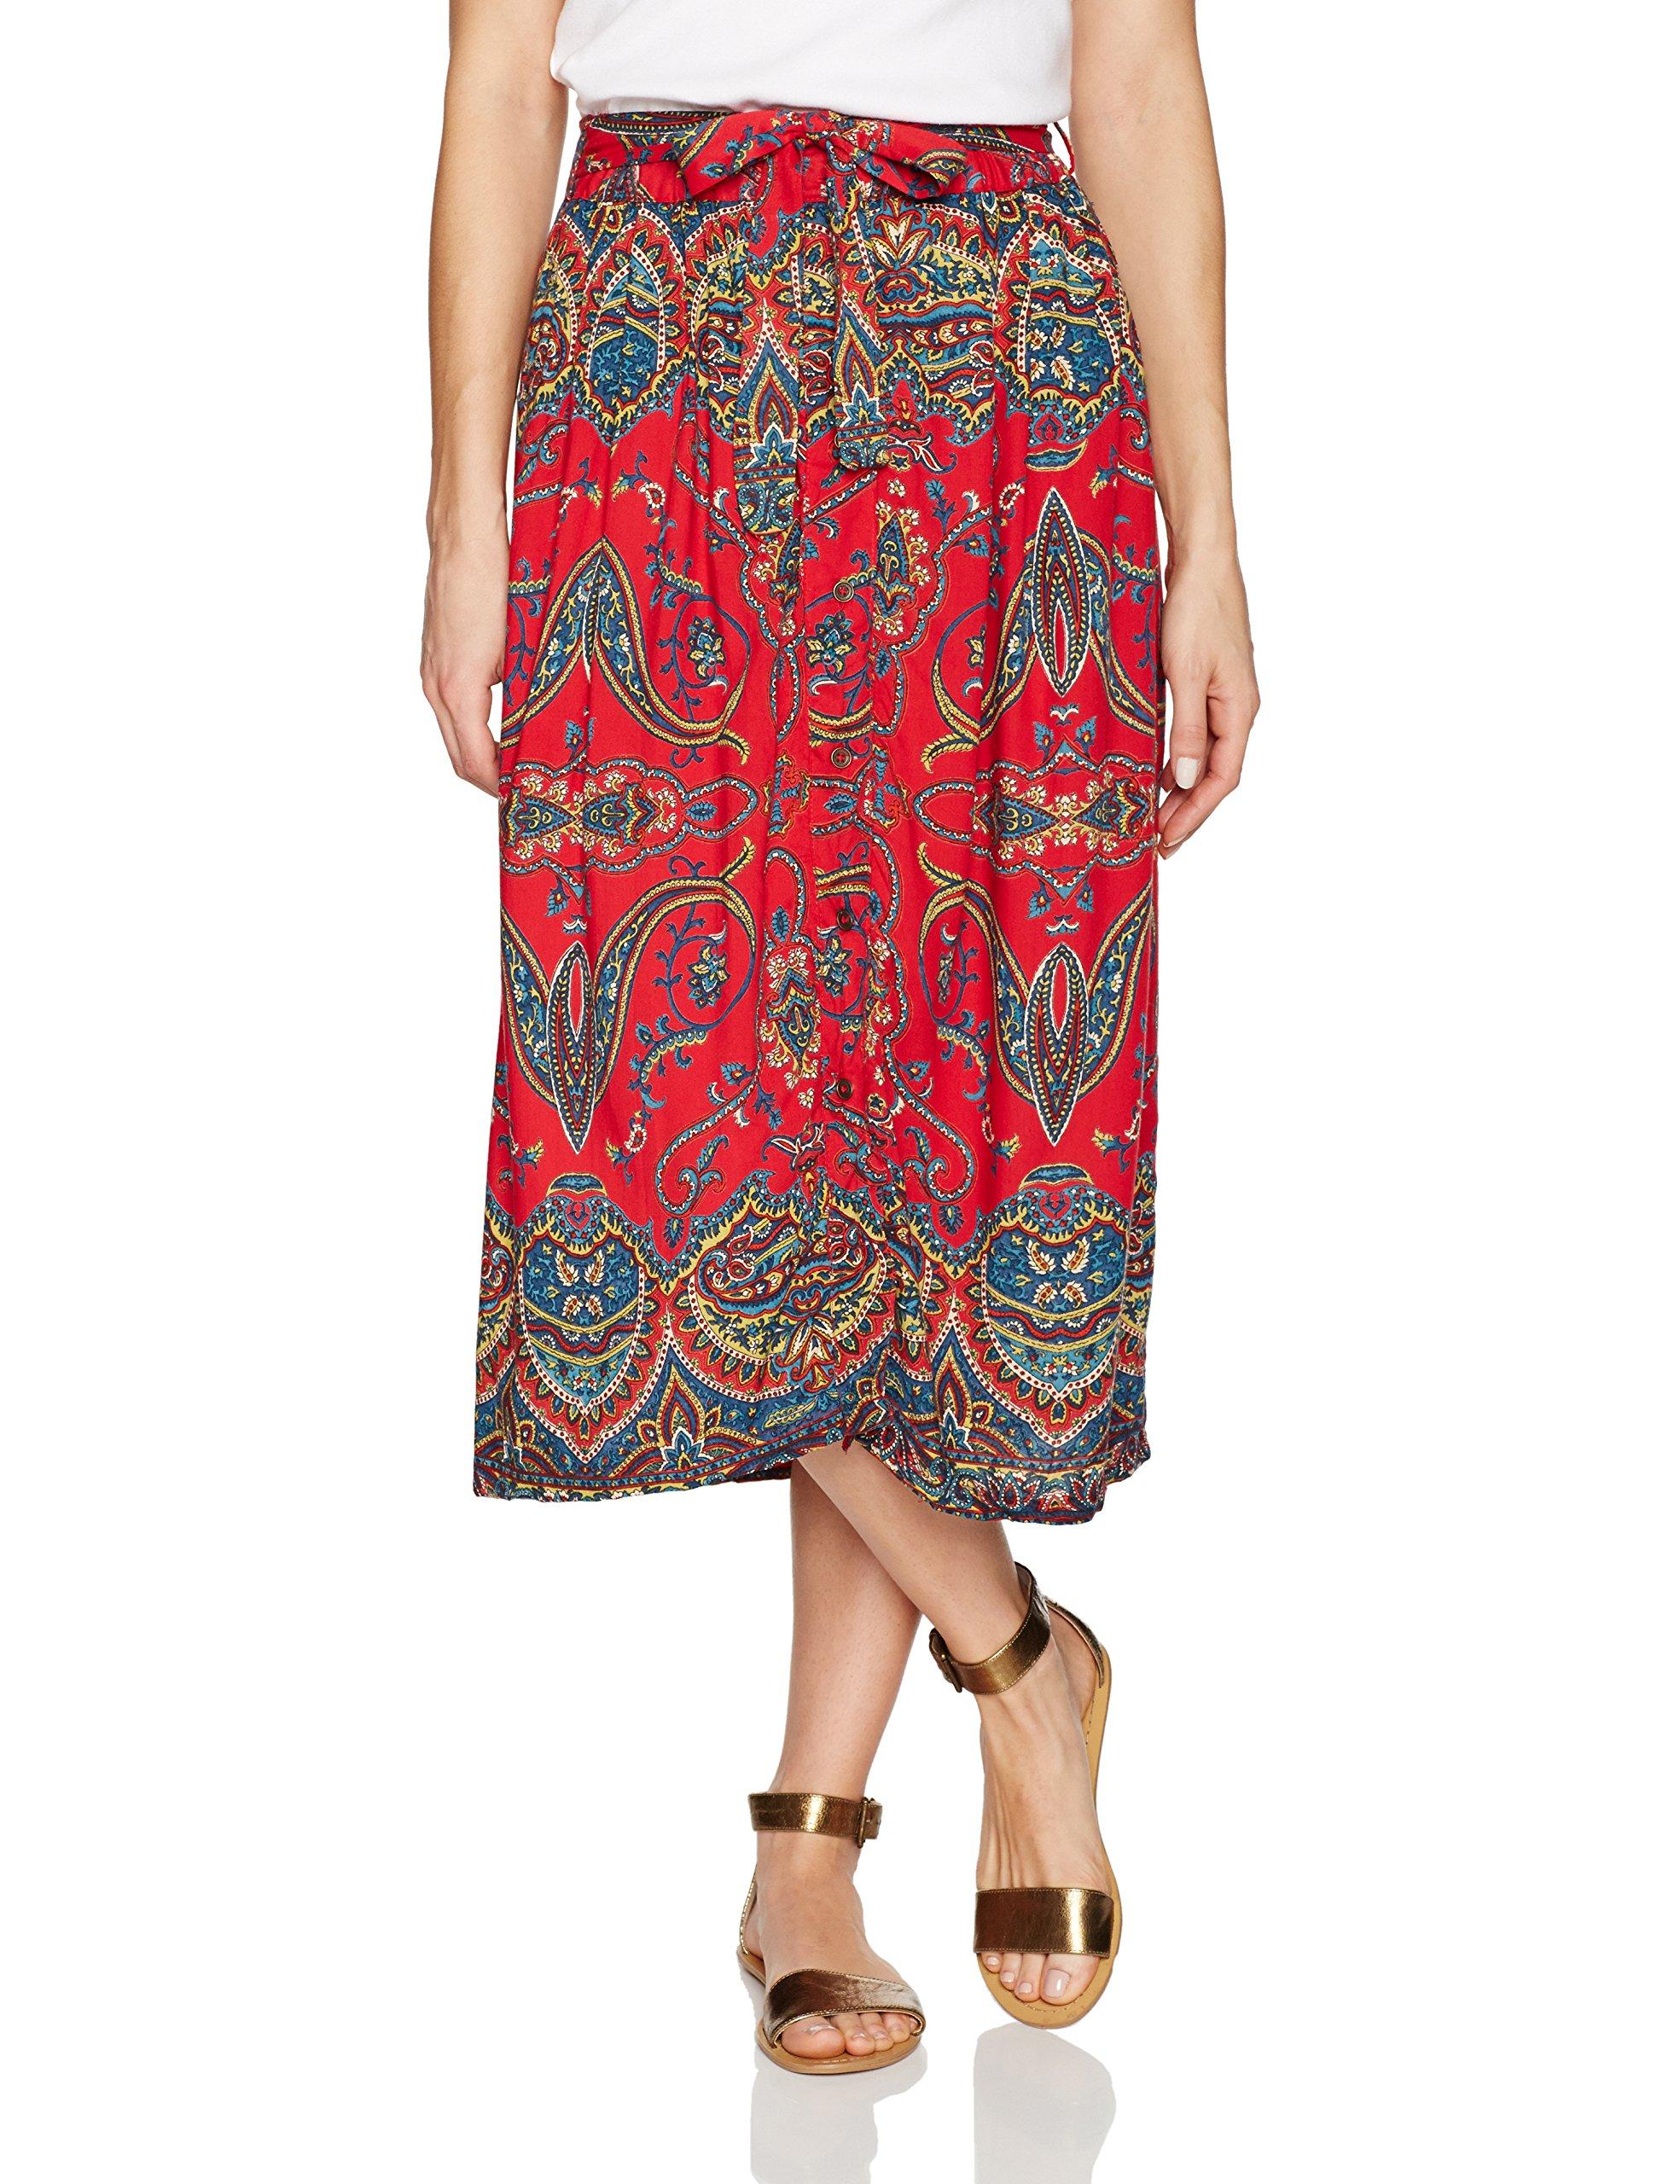 Angie Women's Printed Skirt with Tie Waist, Red, Medium